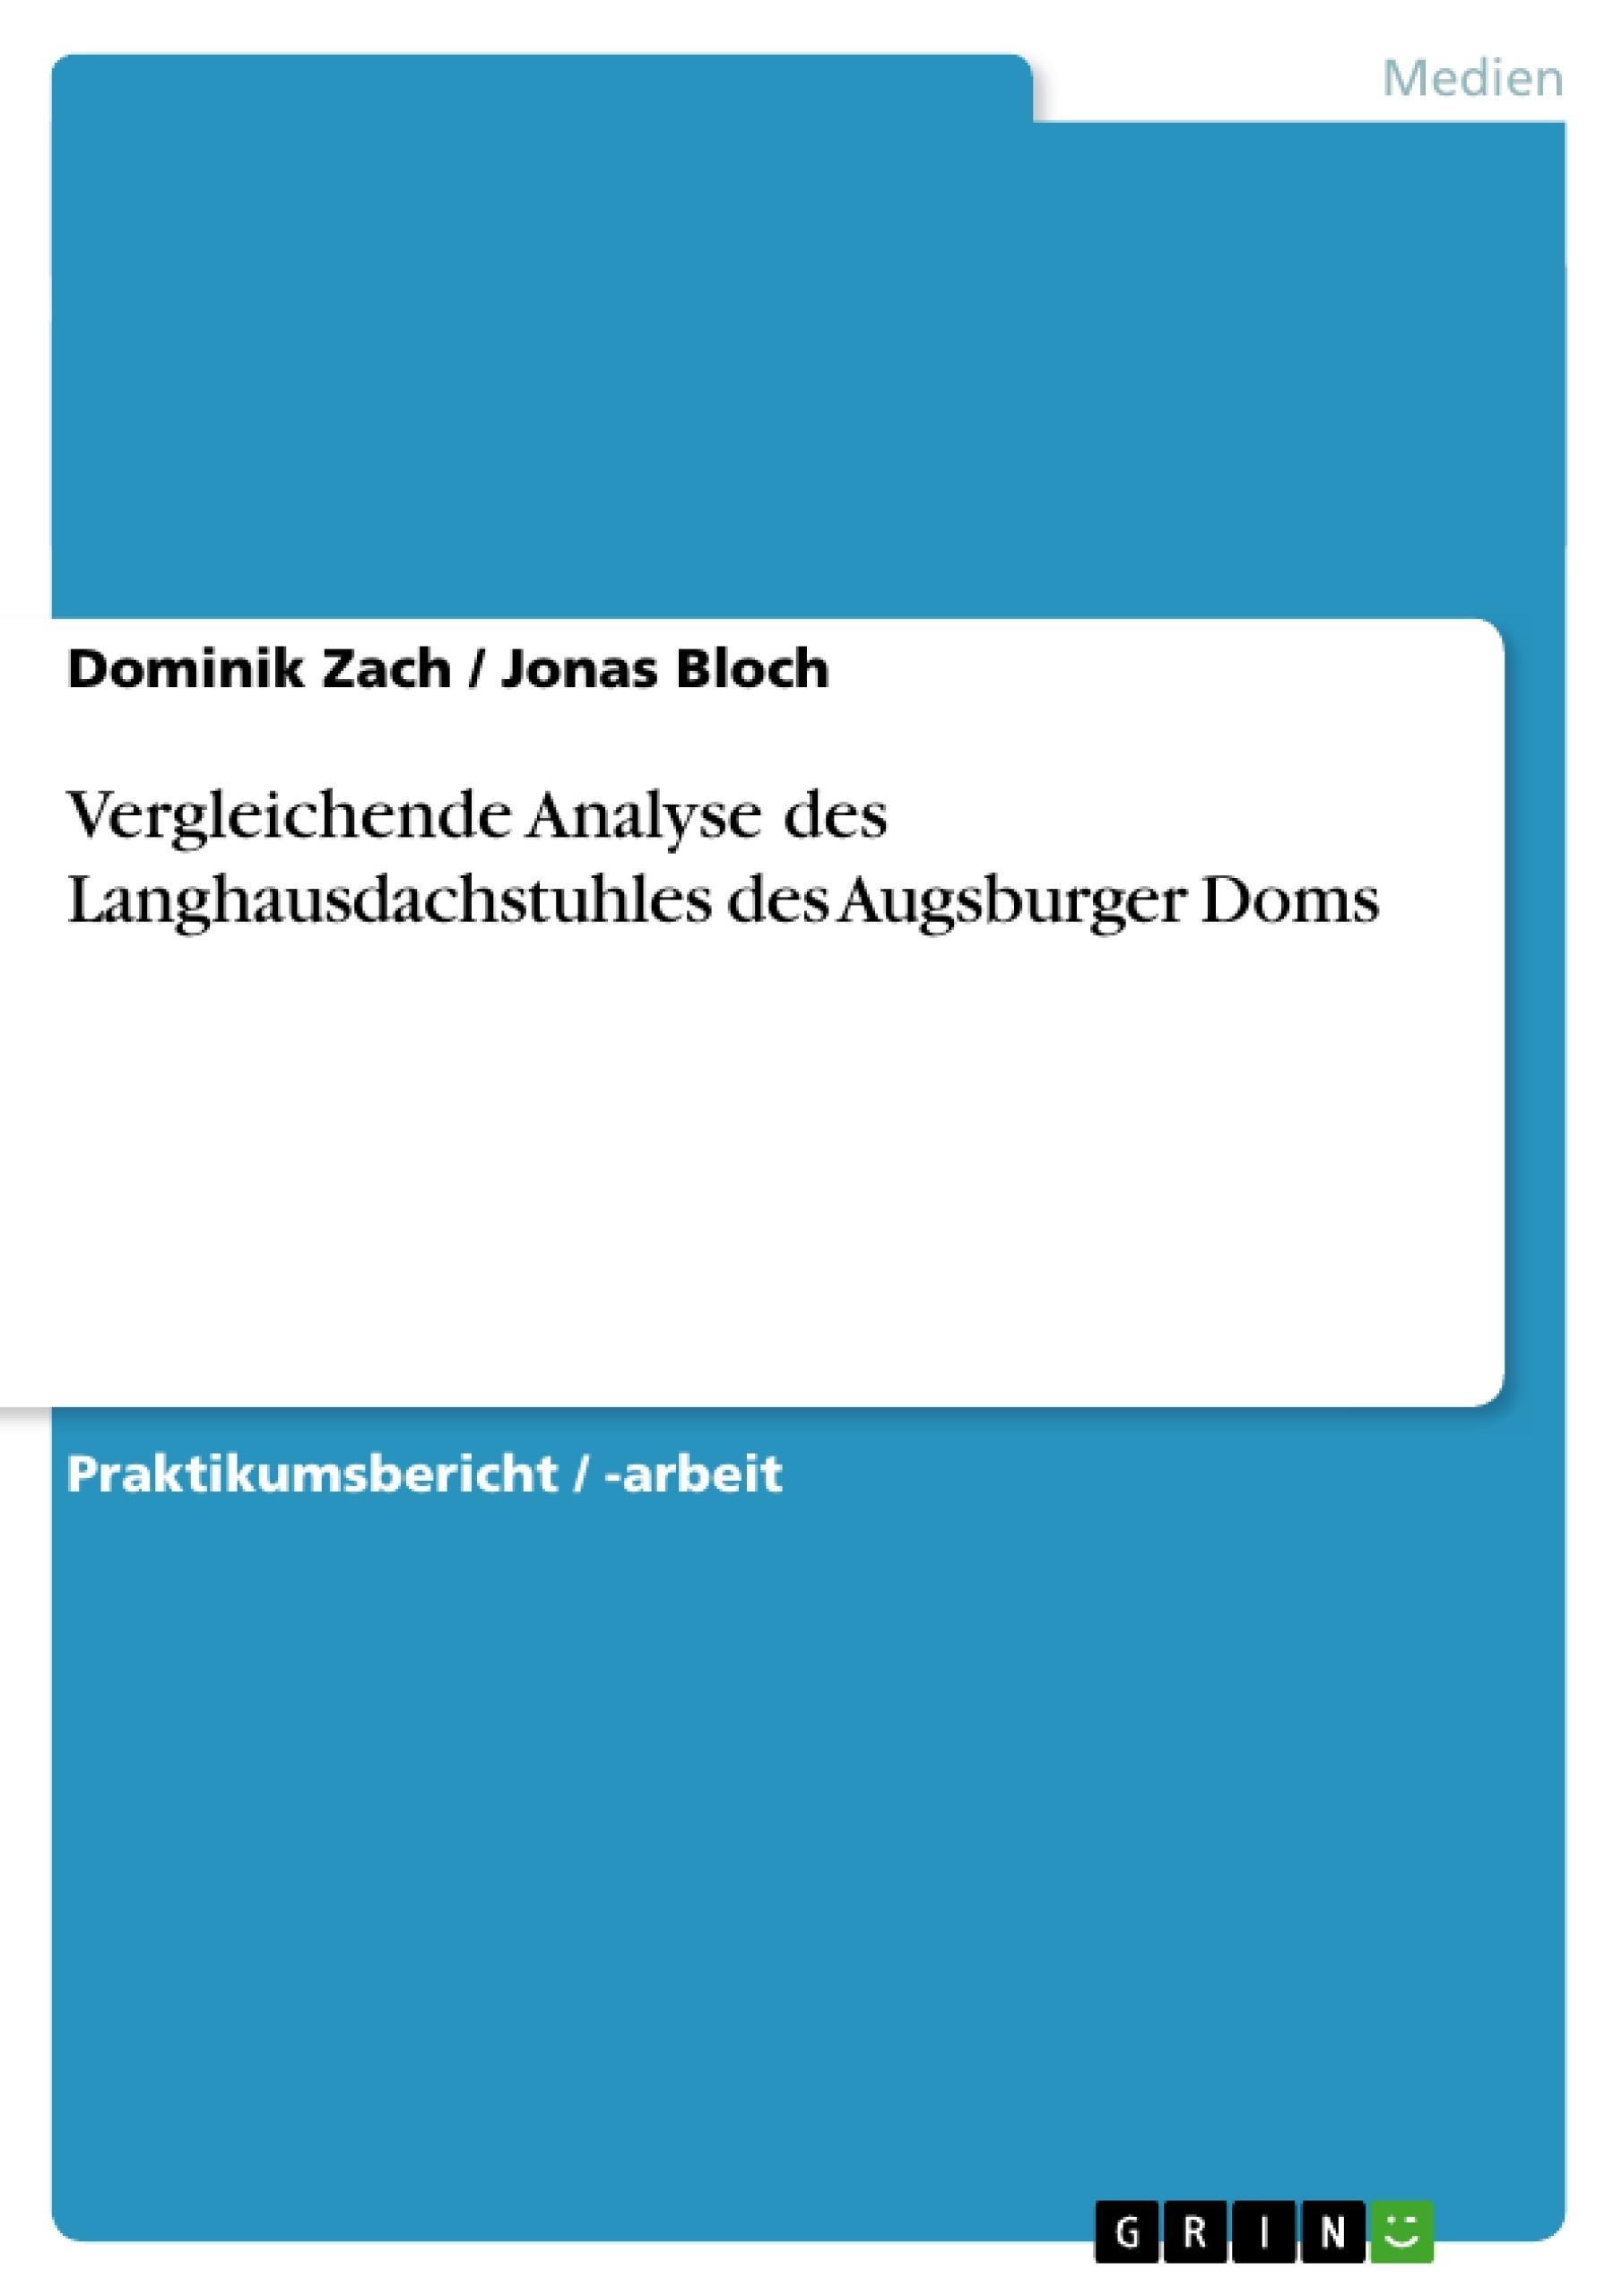 Titel: Vergleichende Analyse des Langhausdachstuhles des Augsburger Doms